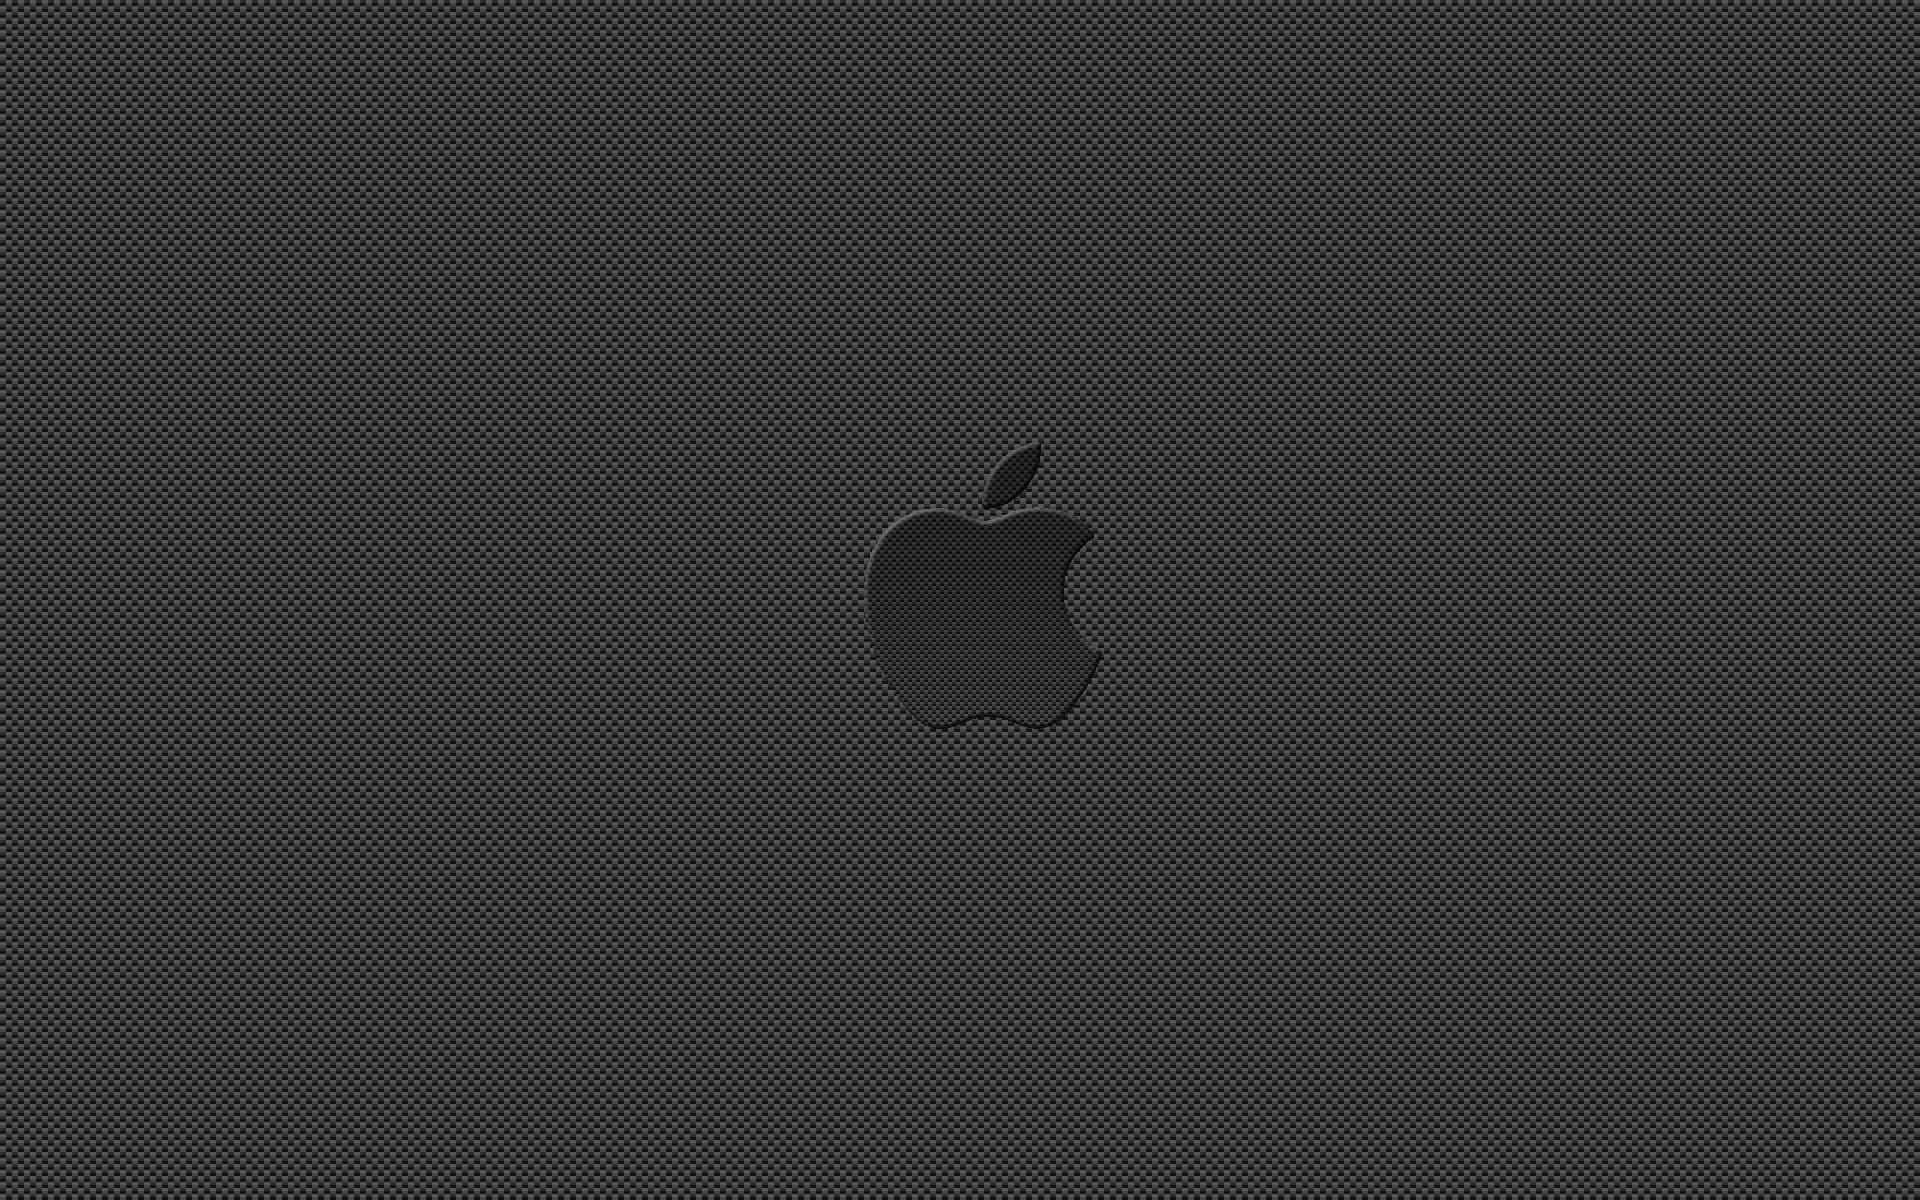 Carbon Fiber Apple by spclffred Carbon Fiber Apple by spclffred